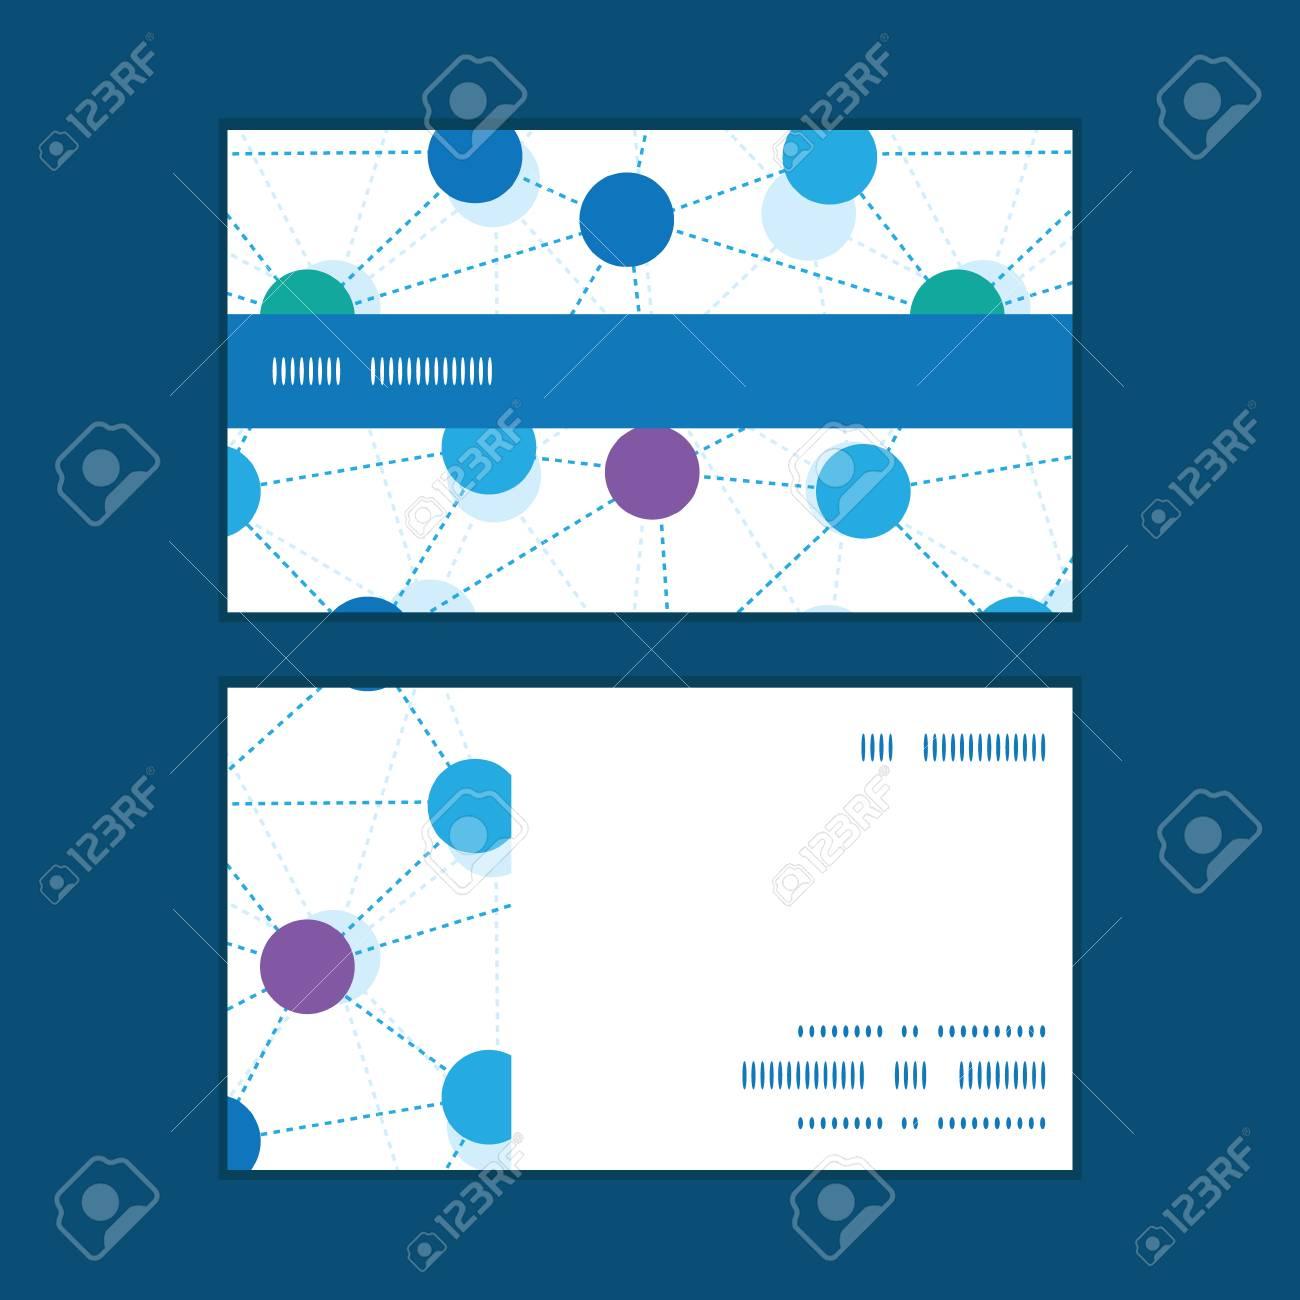 Vector Reli Points Bande Horizontale Motif Dencadrement Cartes De